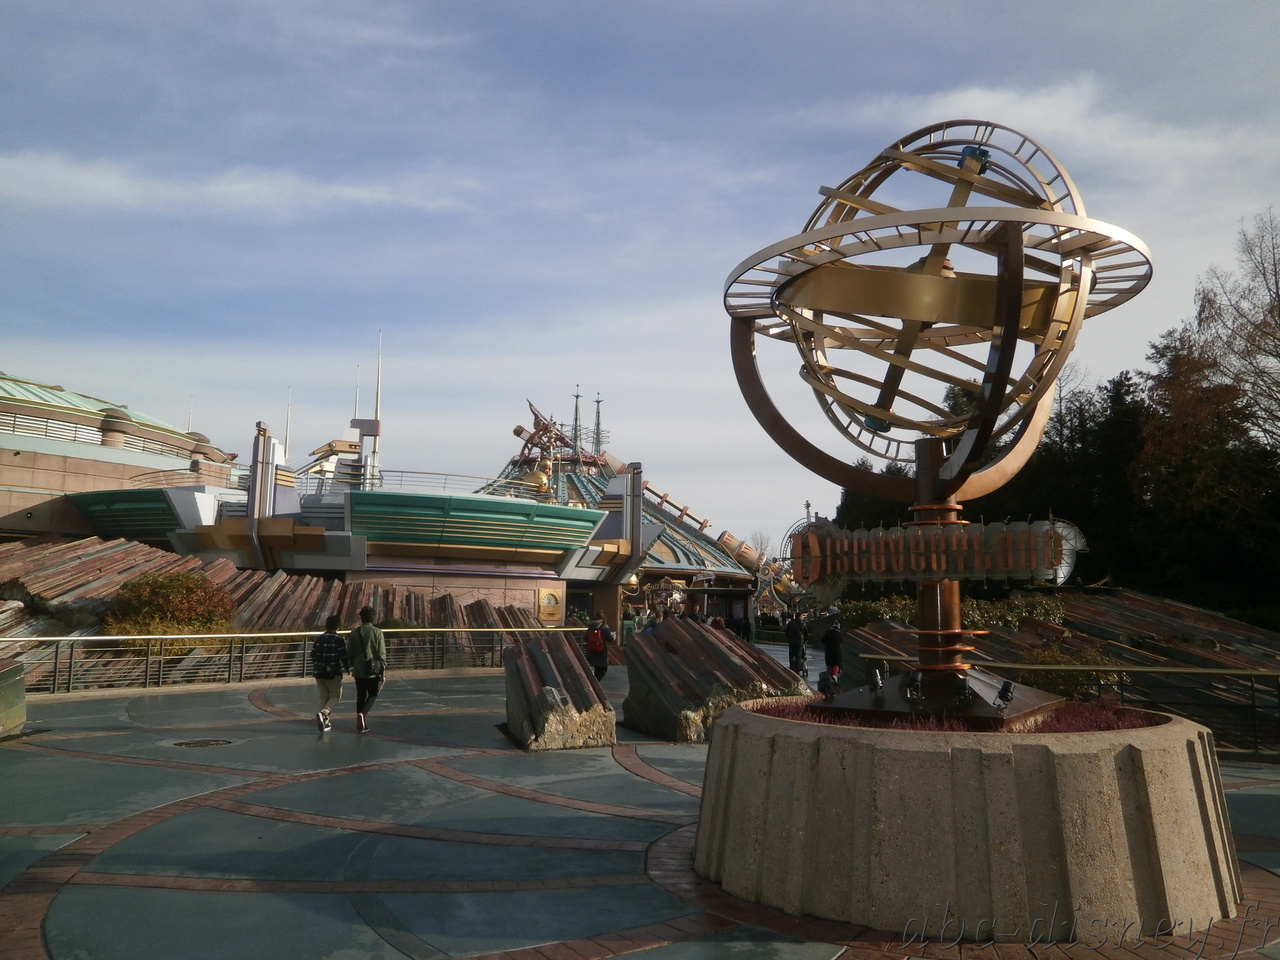 Discoveryland 2